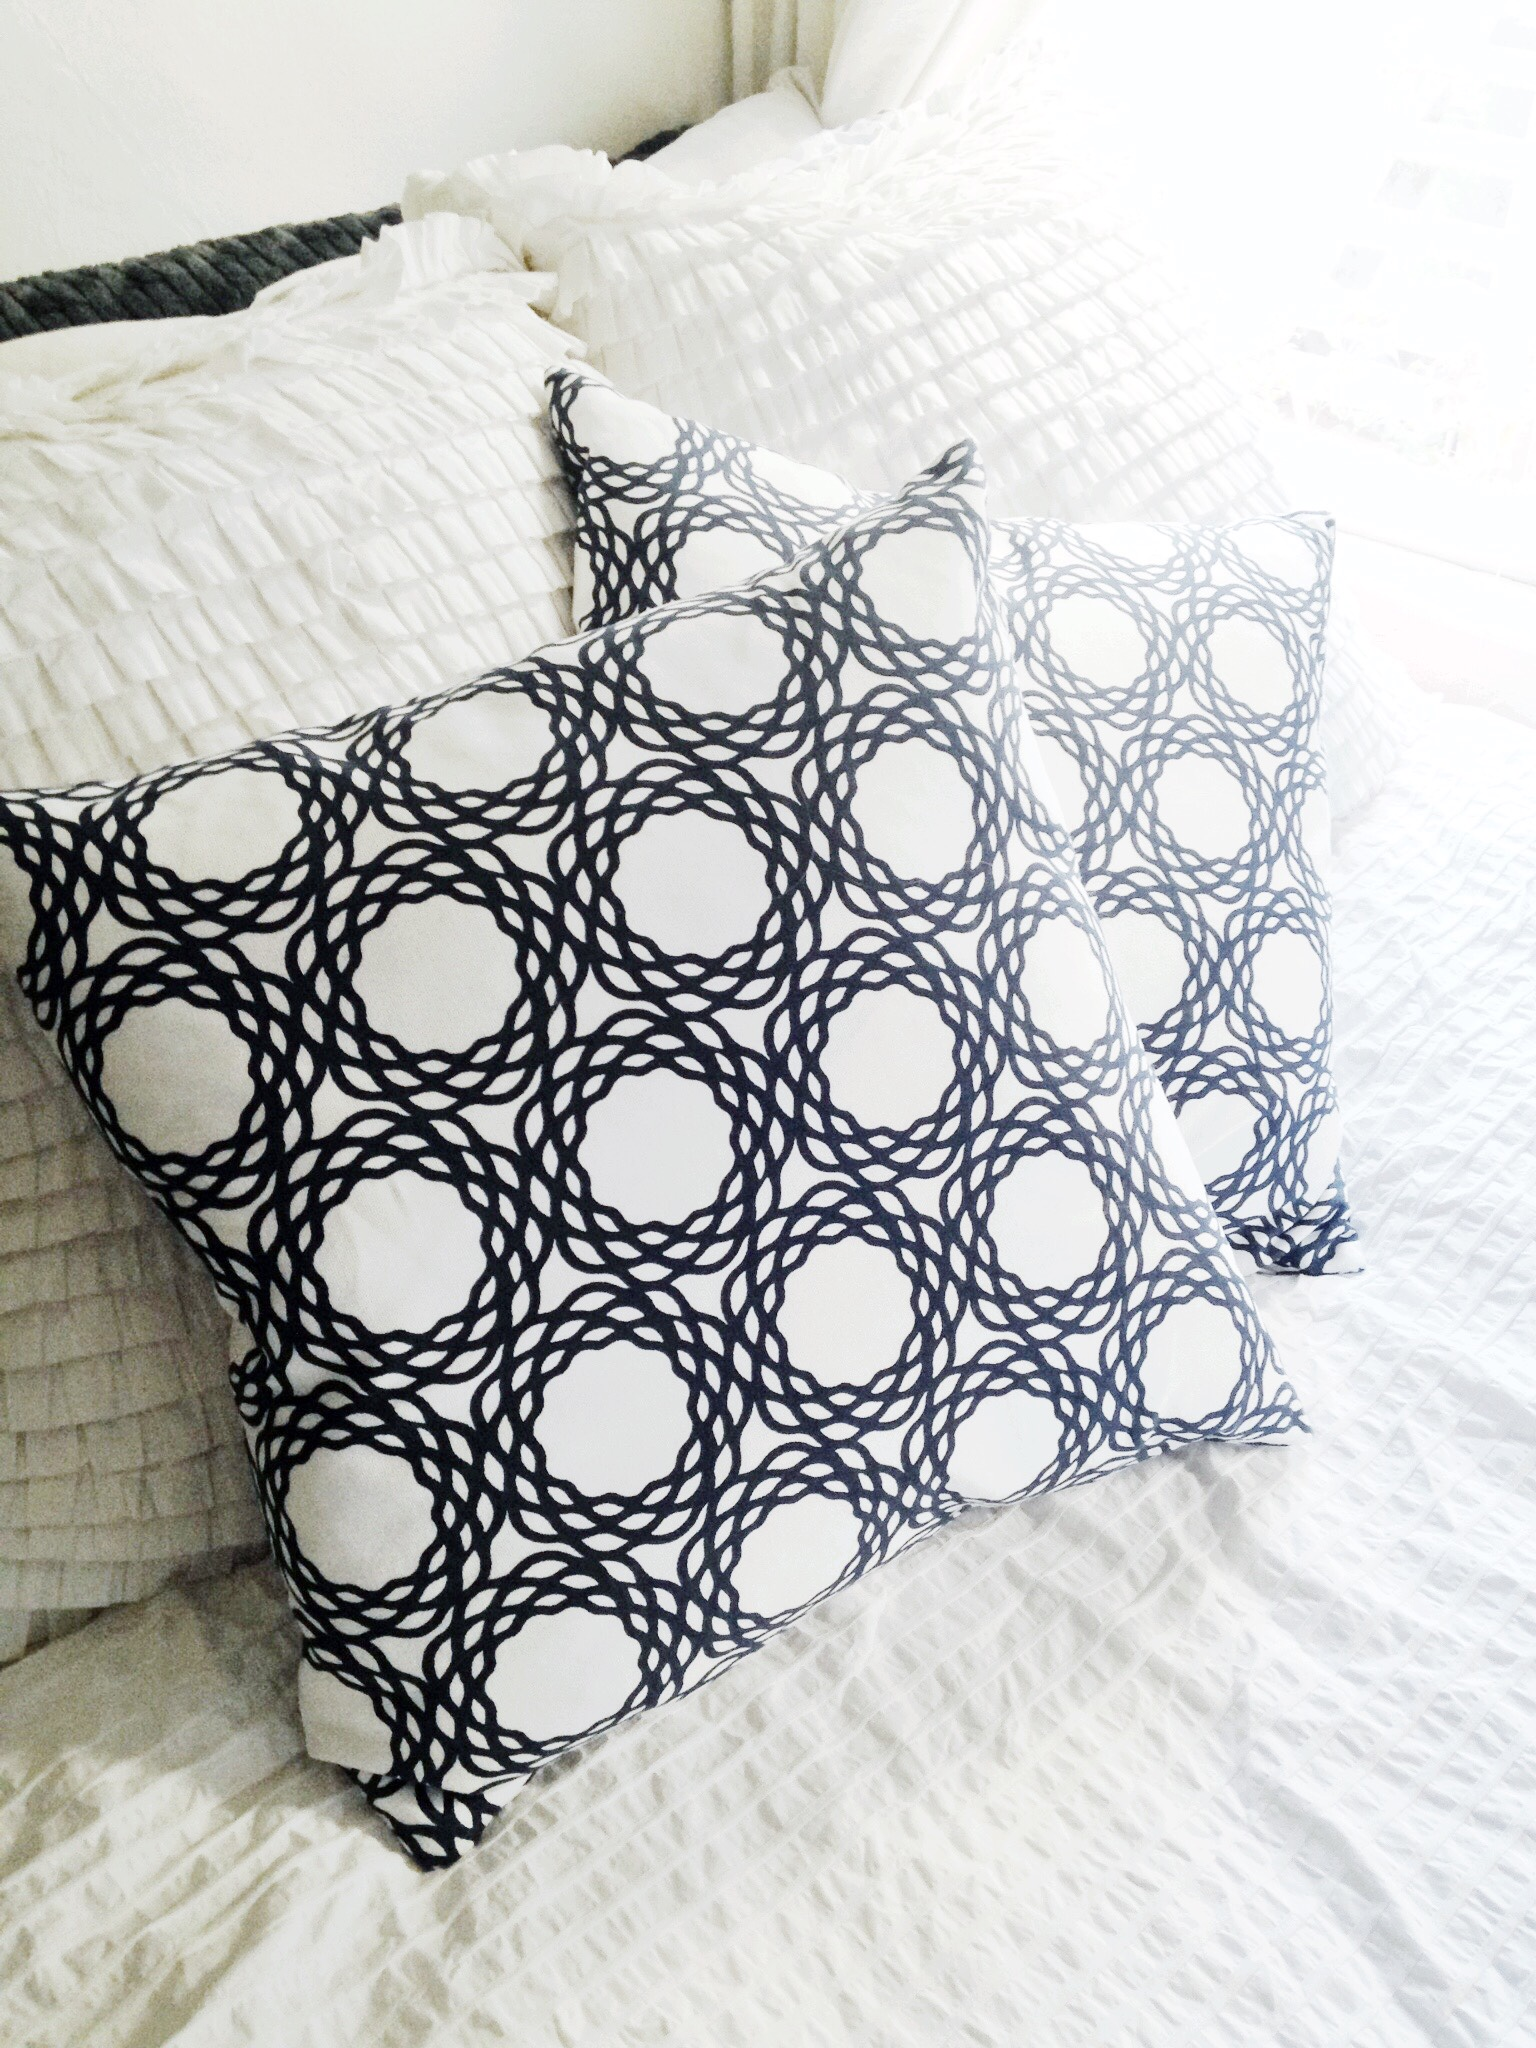 cococozy-oxford-pillow-navy-white-geometric-pattern-print